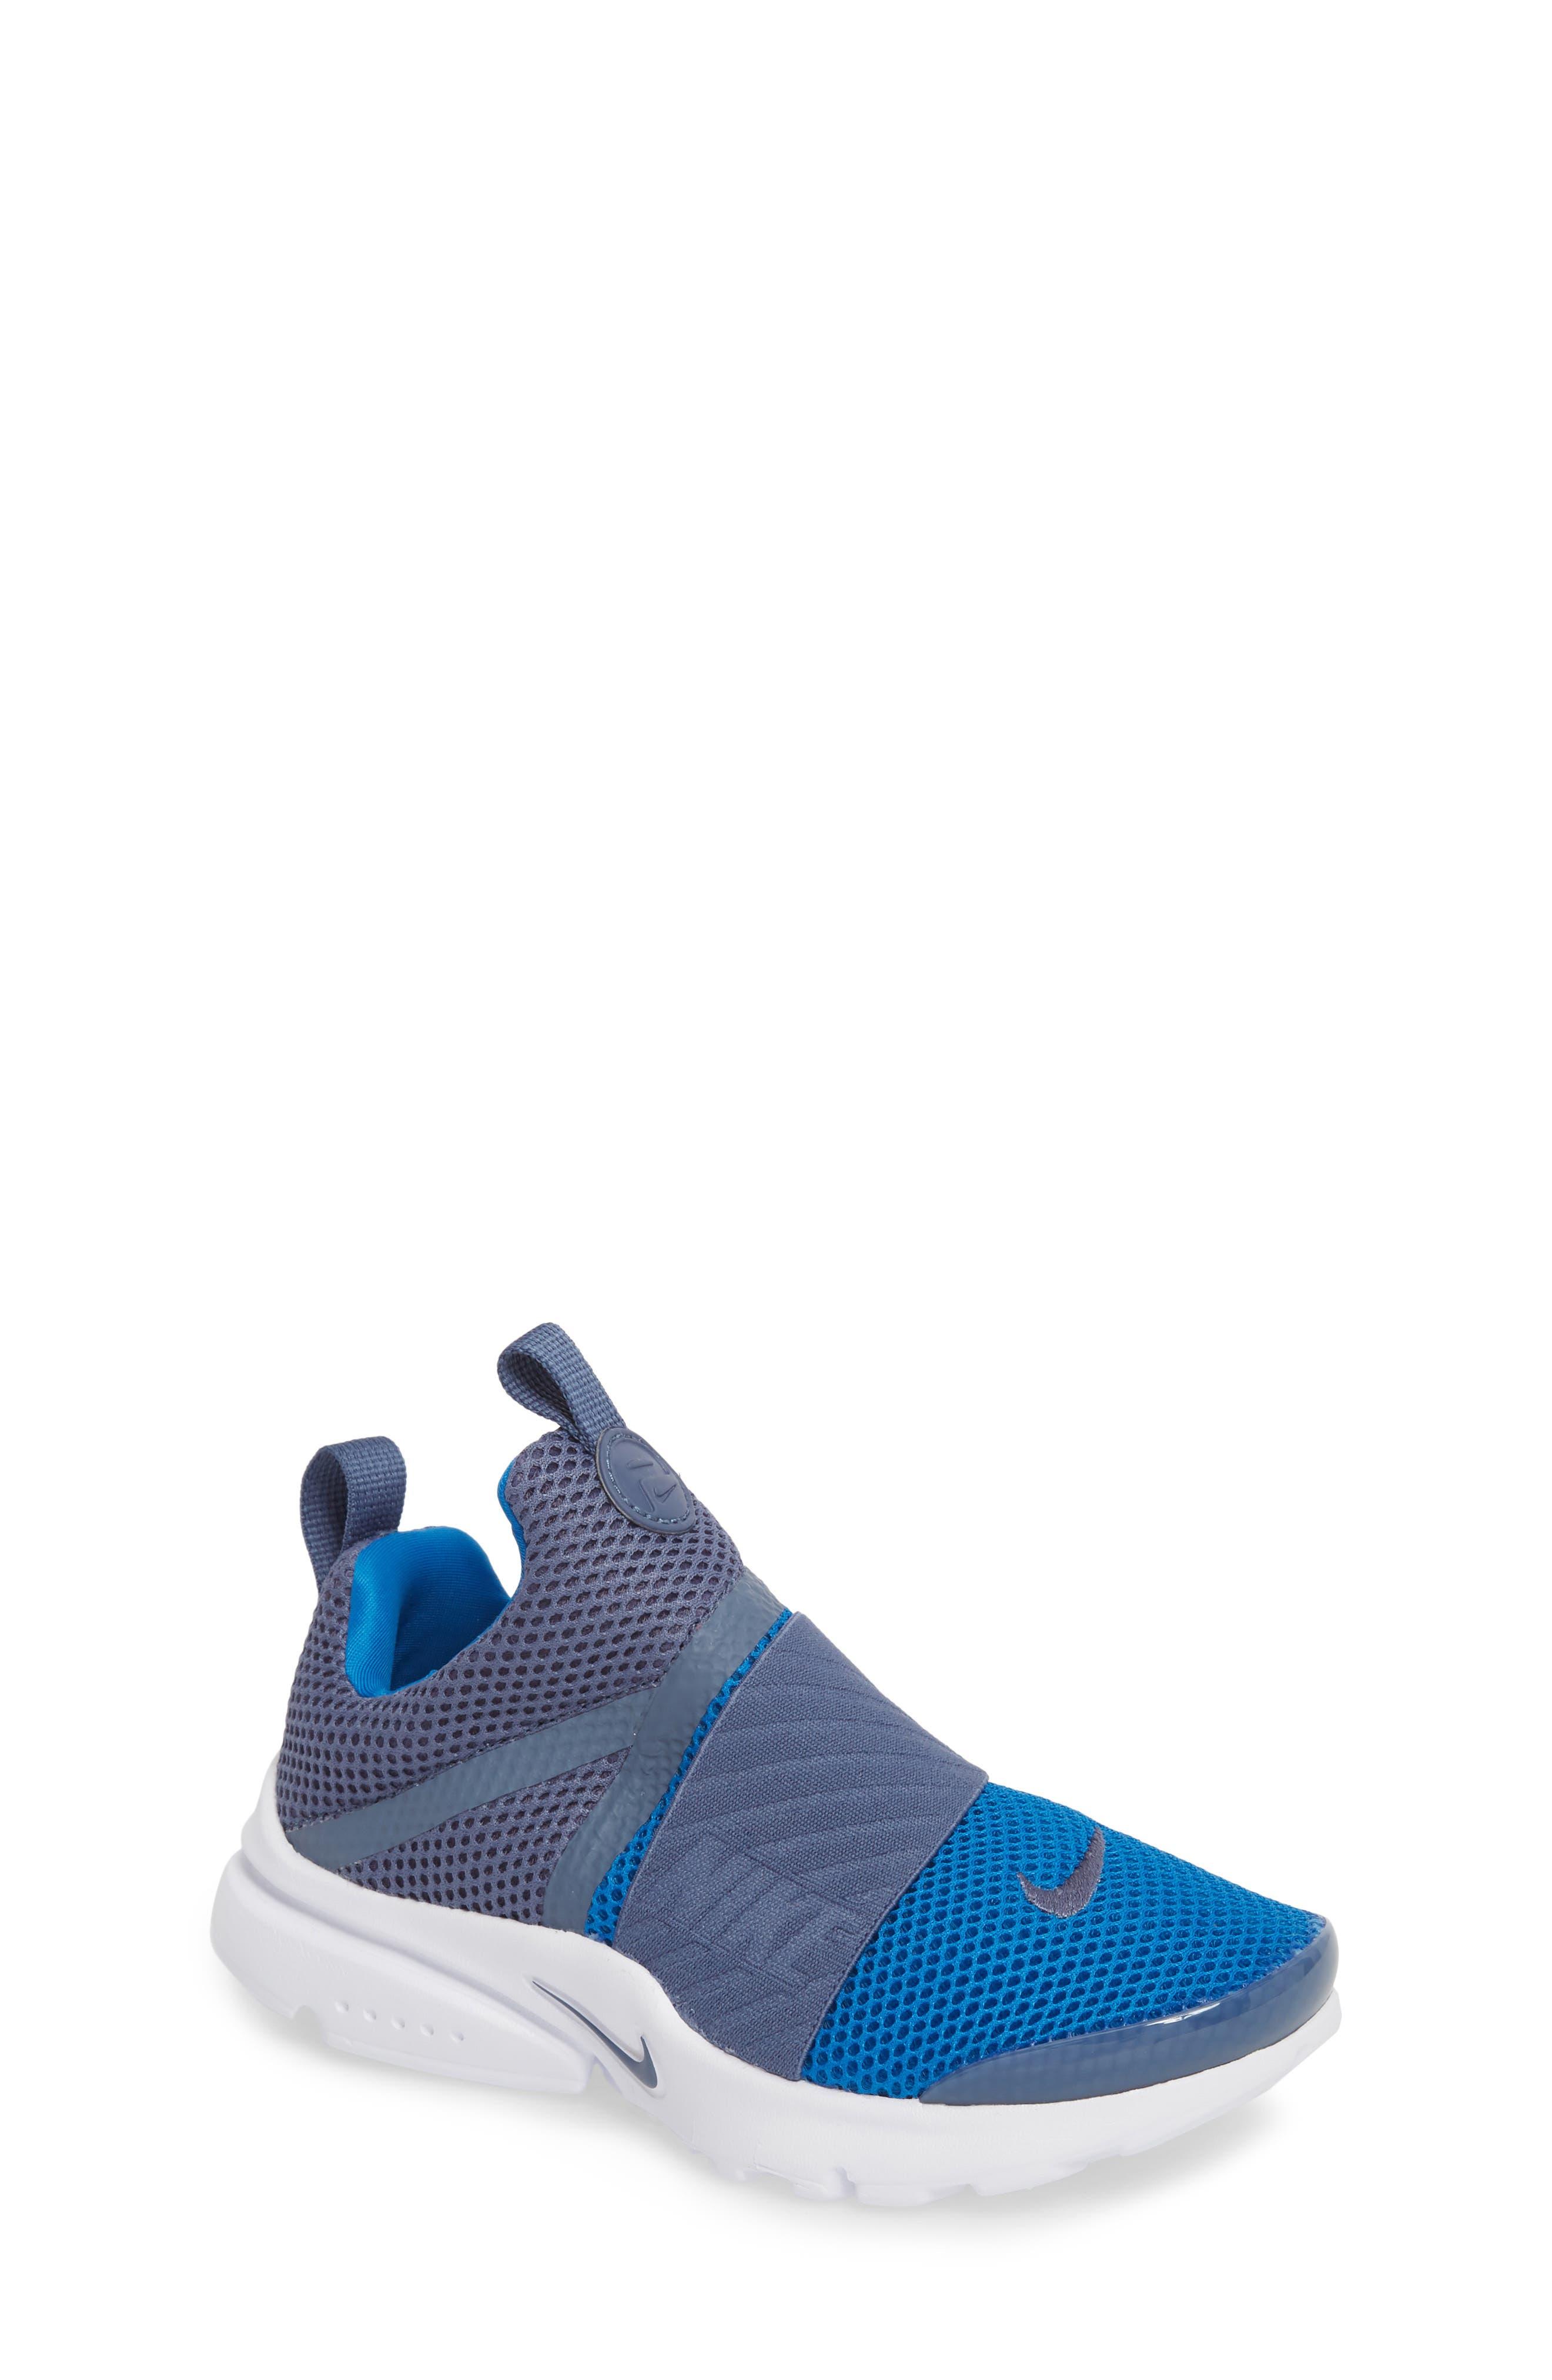 Presto Extreme Sneaker,                             Main thumbnail 5, color,